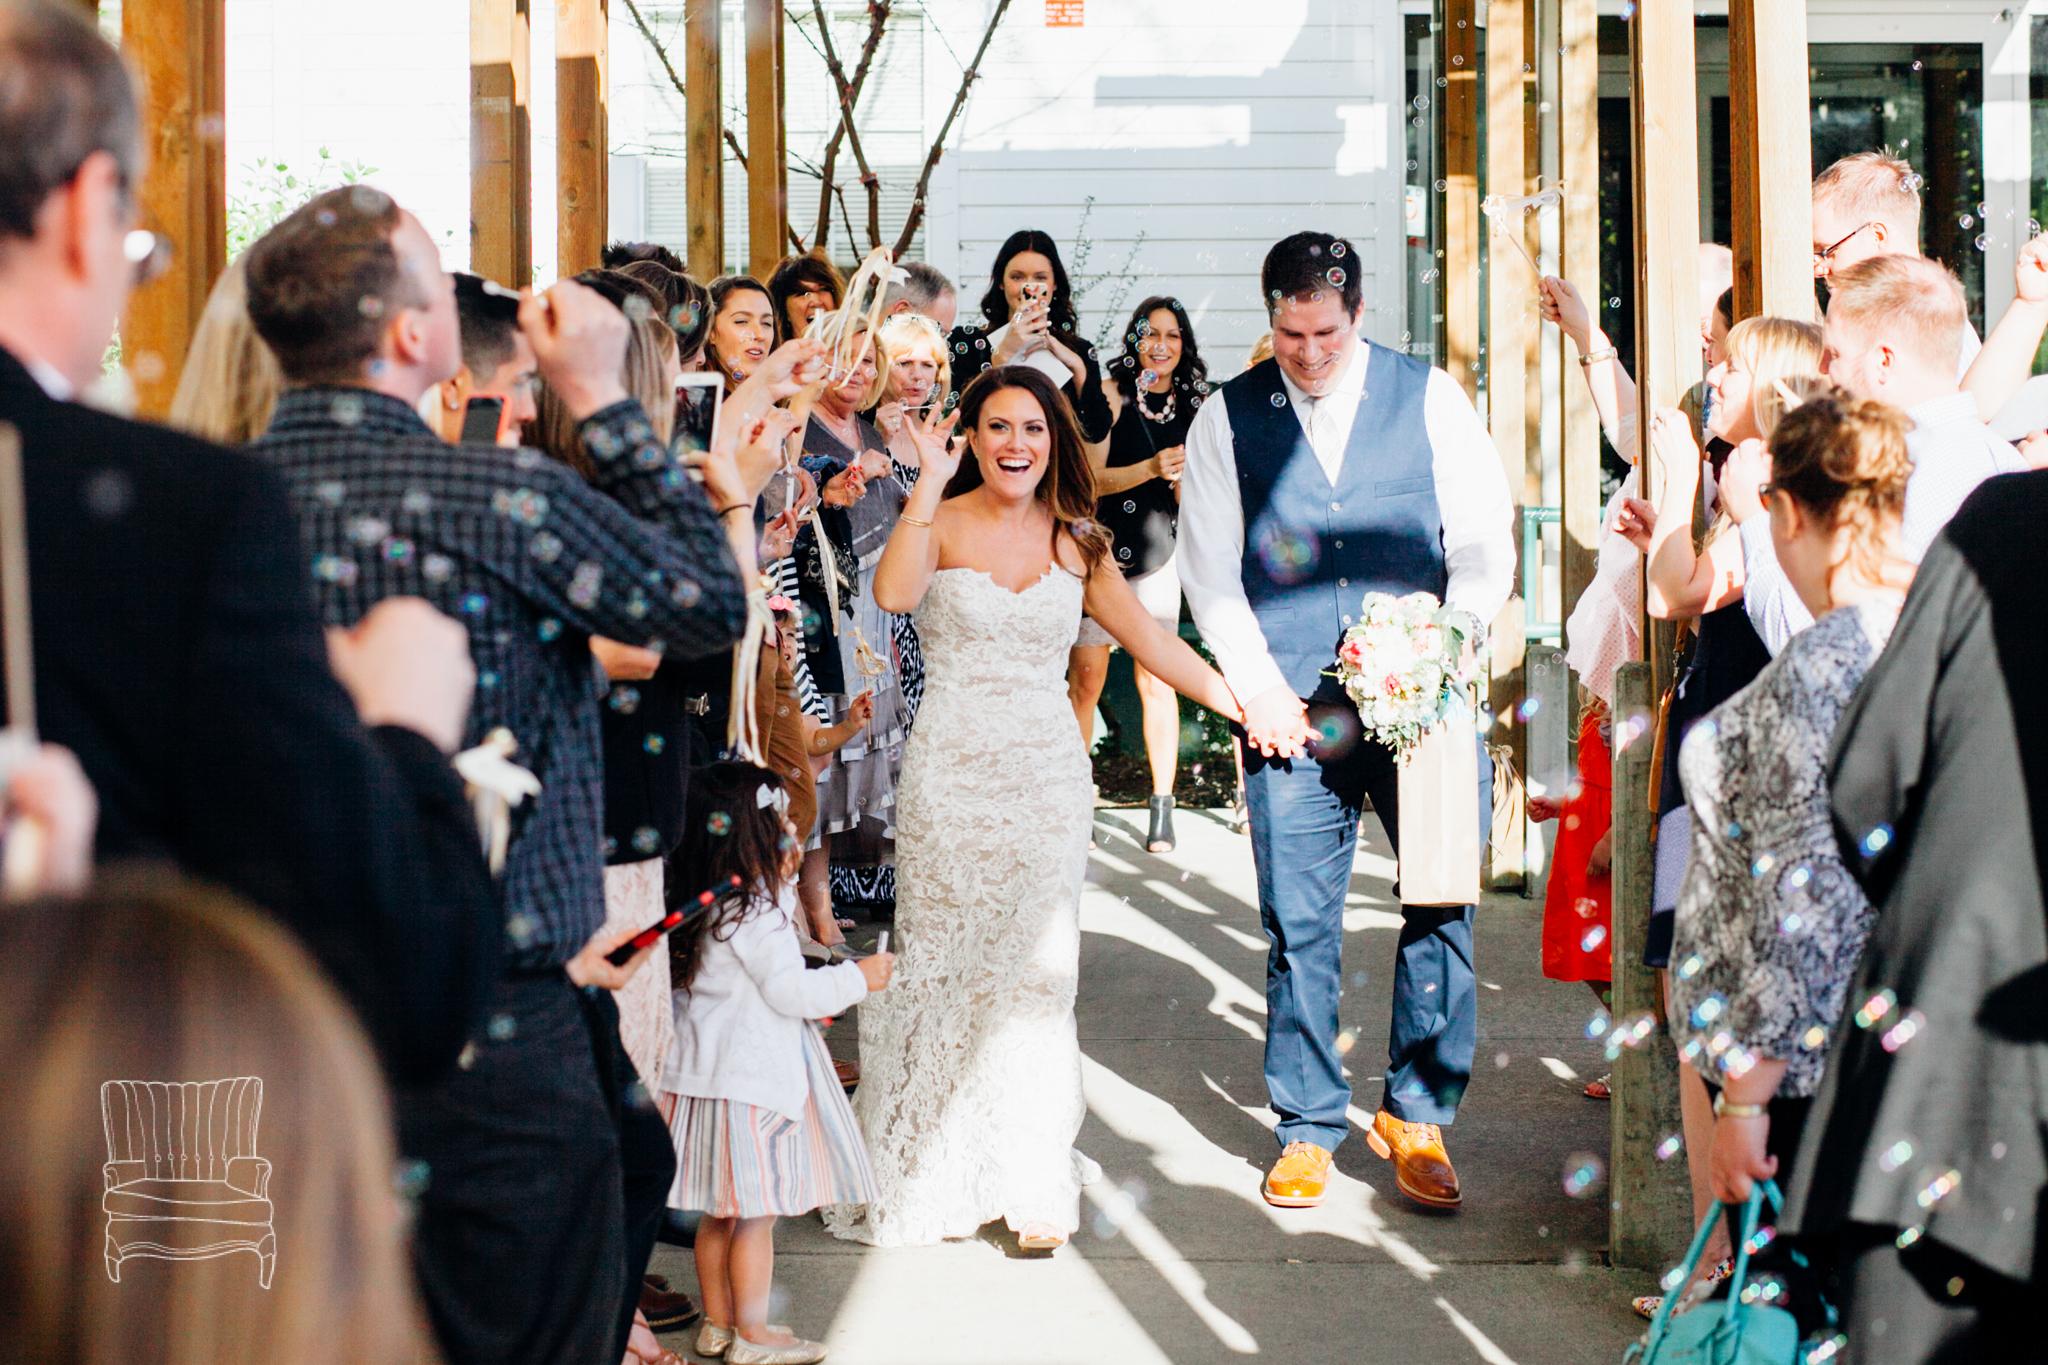 seattle-wedding-photographer-katheryn-moran-russells-bothell-wilkins-wedding-photo-63.jpg